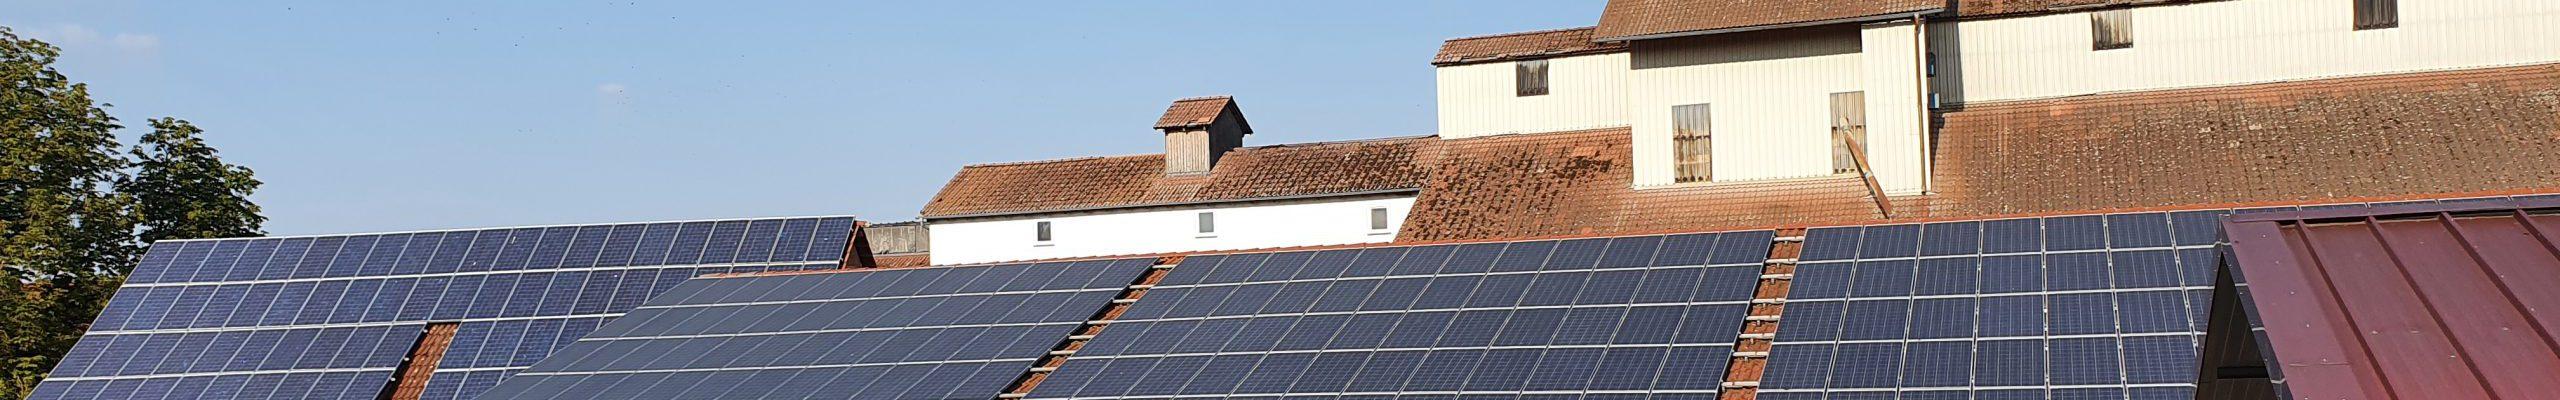 OBEG_Photovoltaik_Nachhaltigkeit